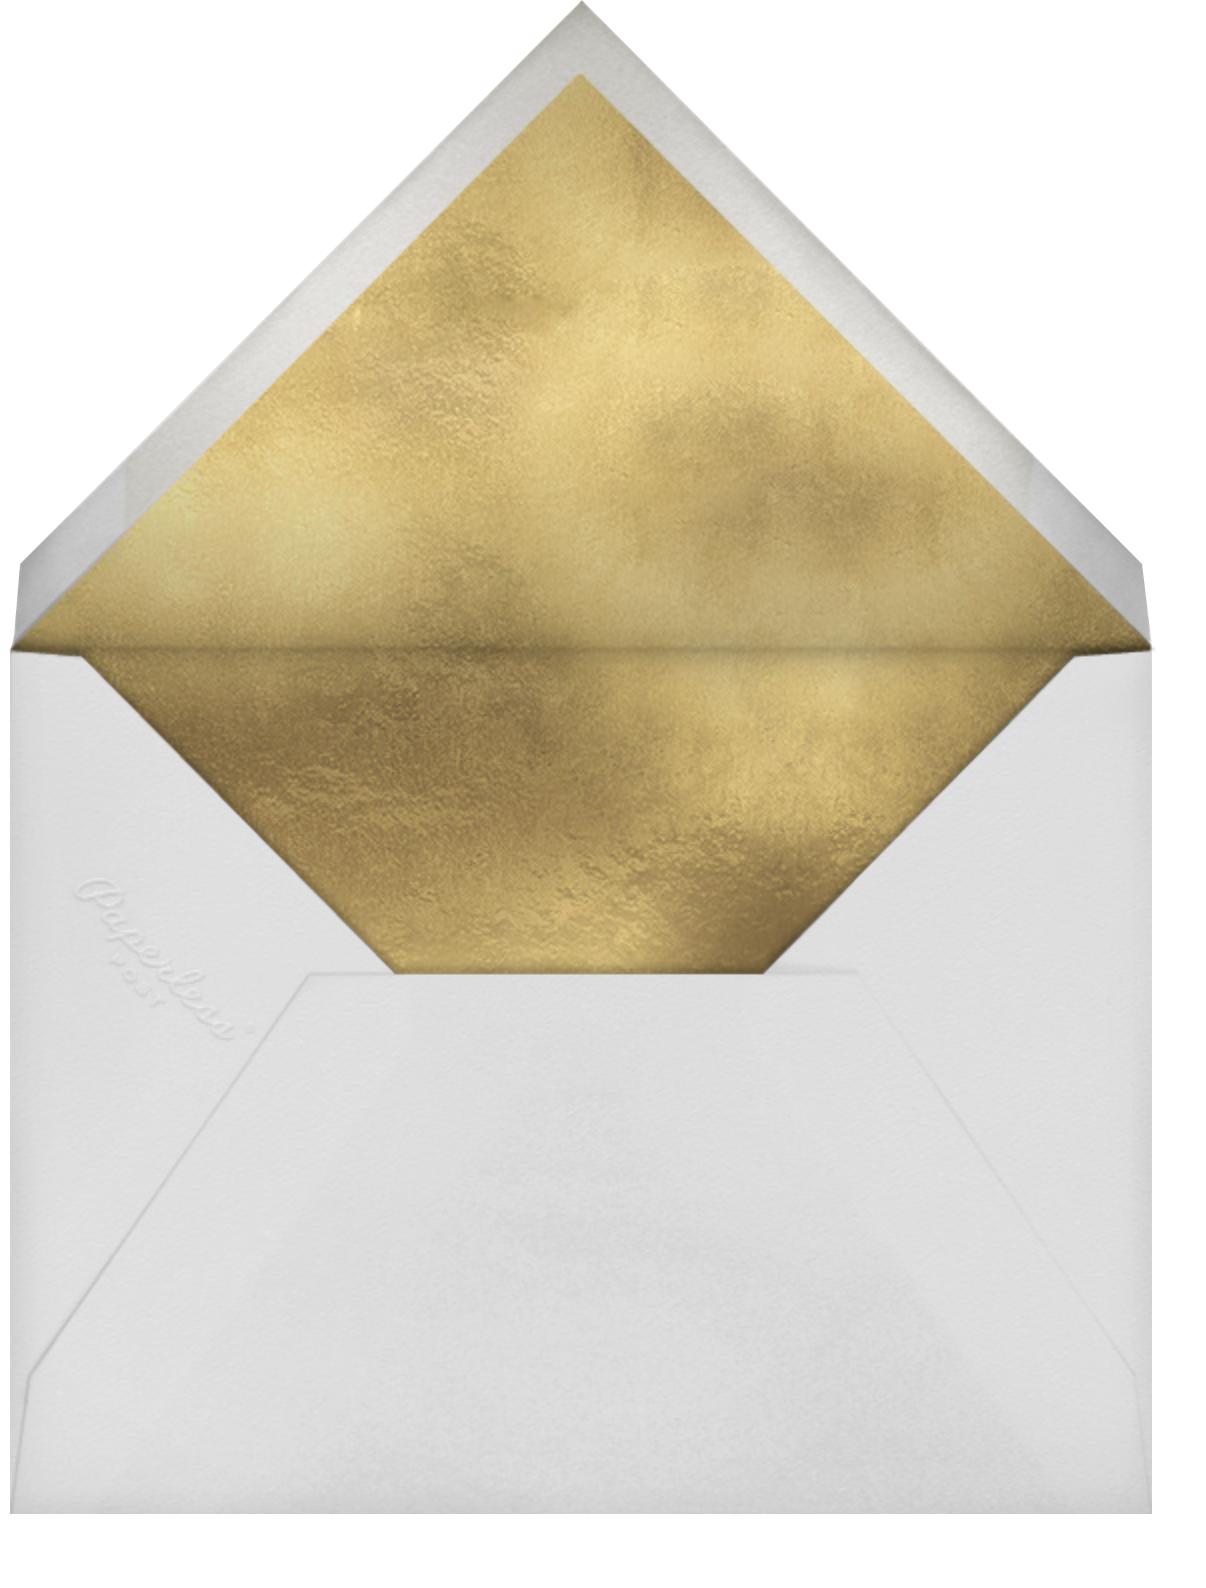 Ribbon Kitten - kate spade new york - Holiday cards - envelope back